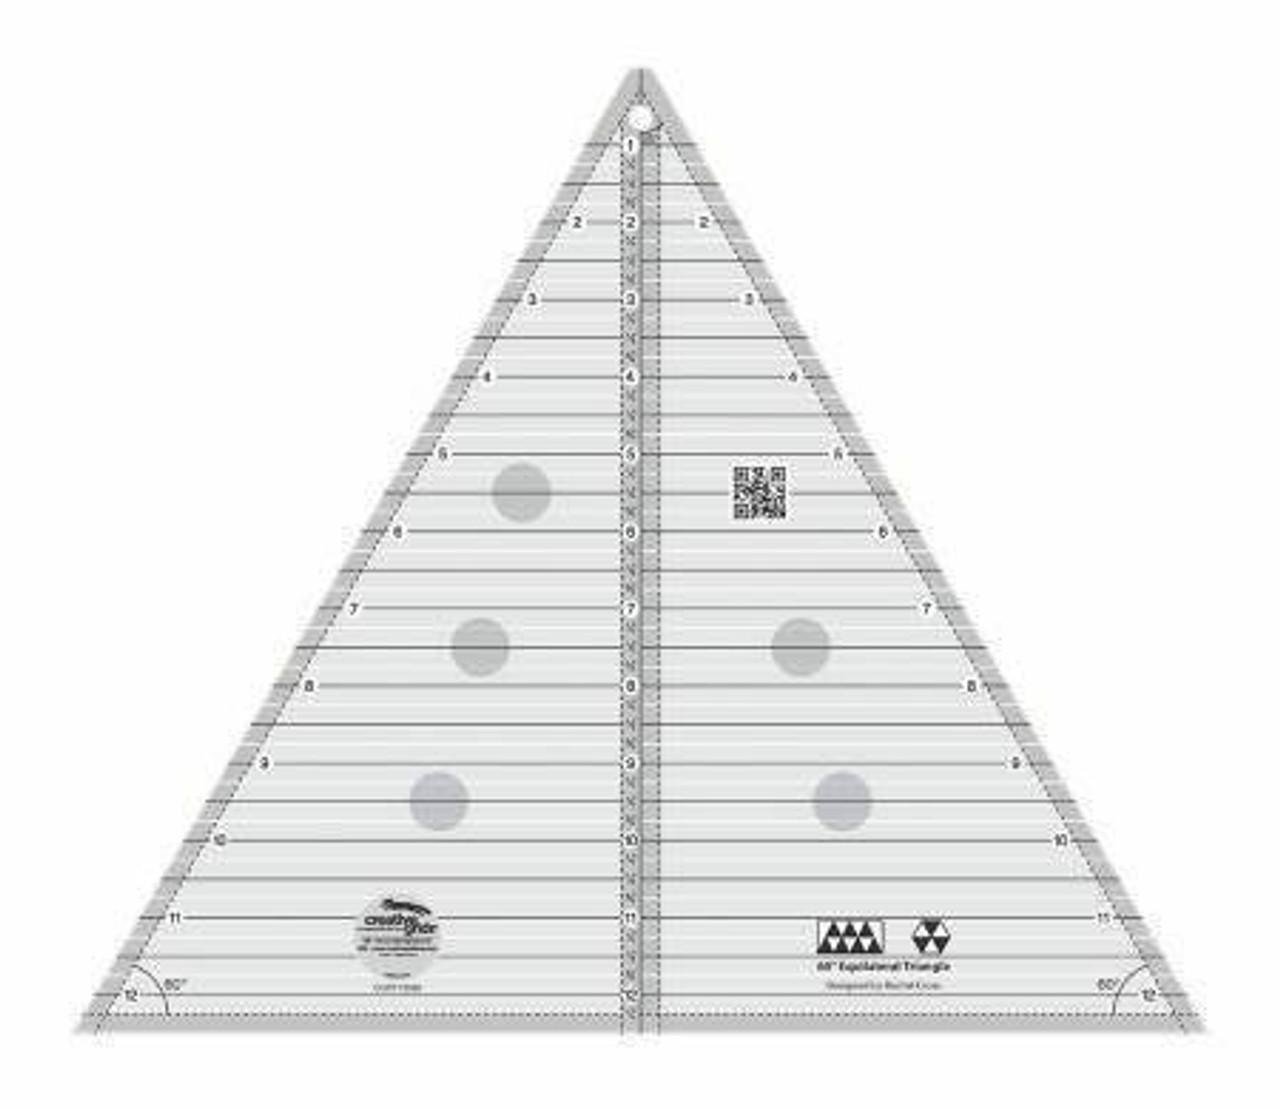 "Creative Grids 60 Degree Triangle 12.5"" Ruler"